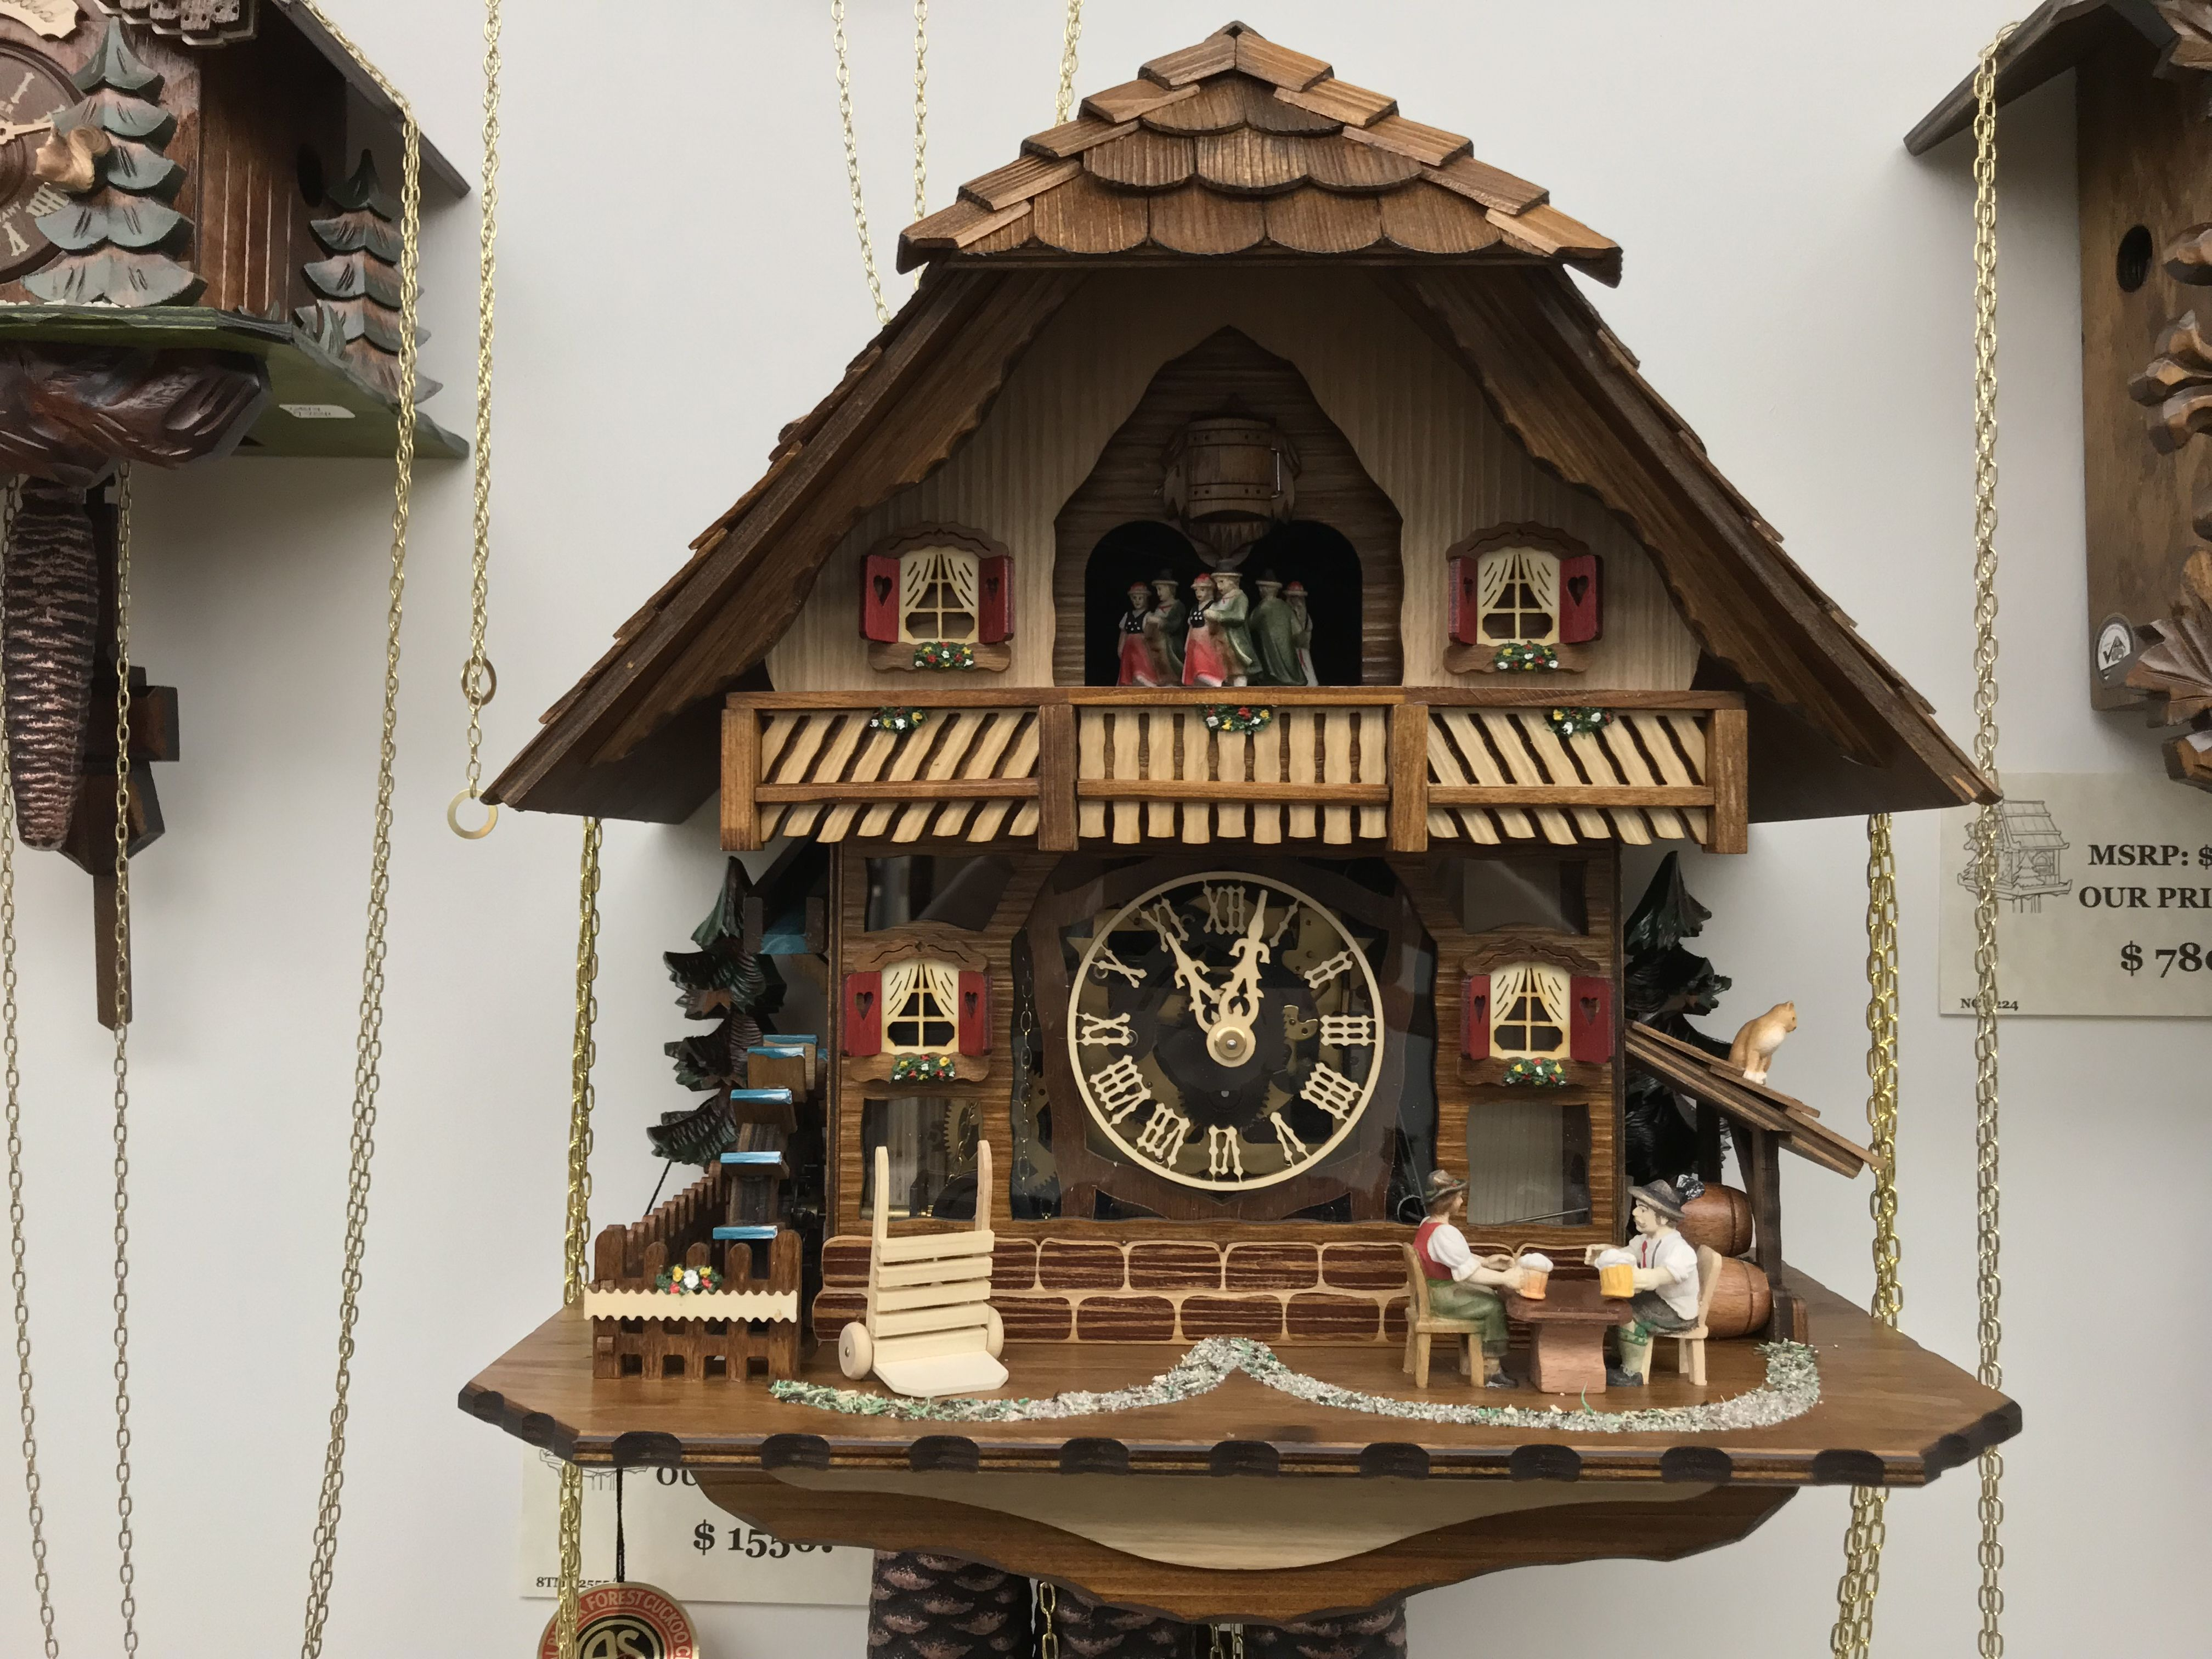 Pin By Mcguire S Clocks On Black Forest Cuckoo Clocks Cuckoo